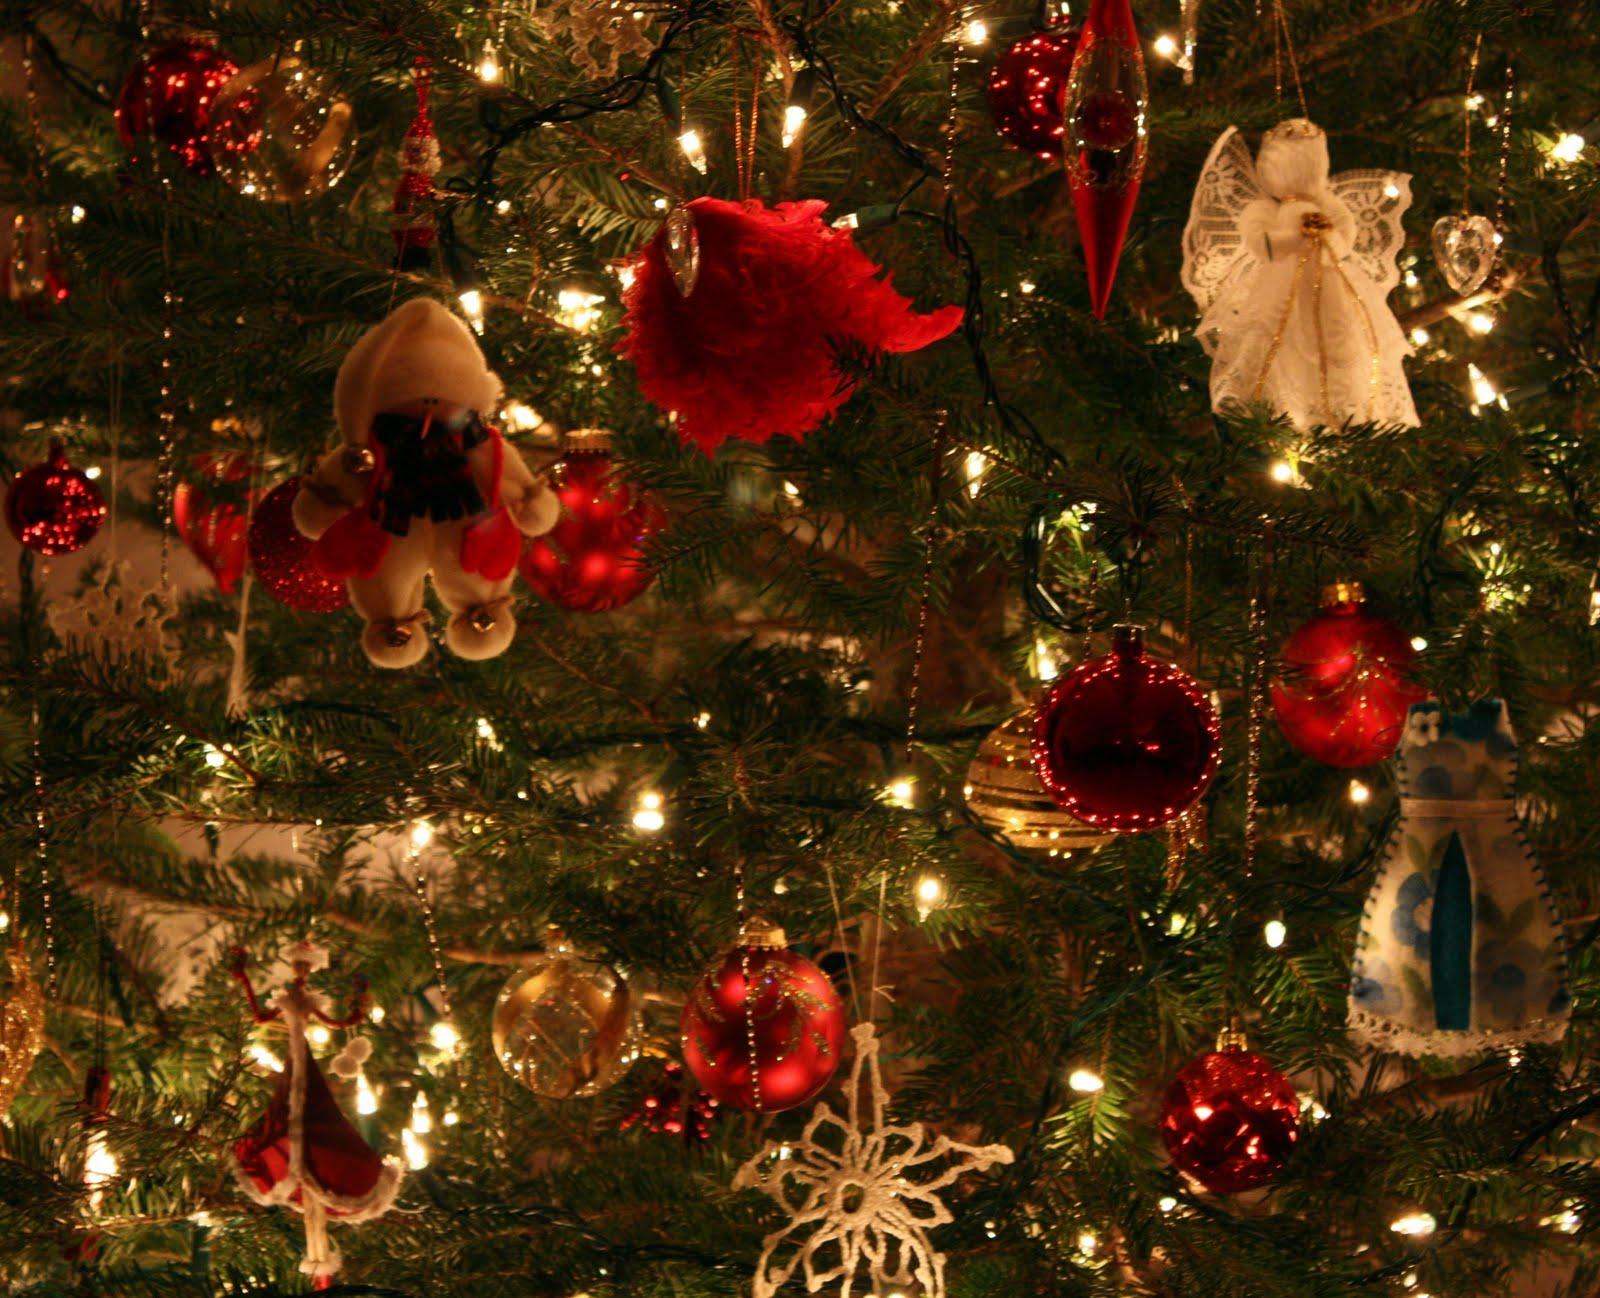 Carol Steel: Christmas Tree Decorations